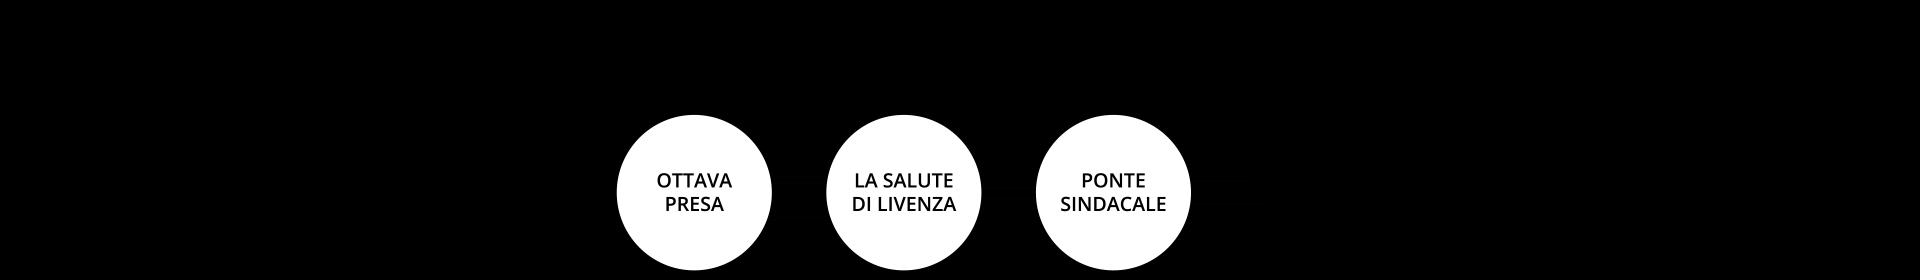 Linea 2: da Caorle a Portogruaro | ATVO